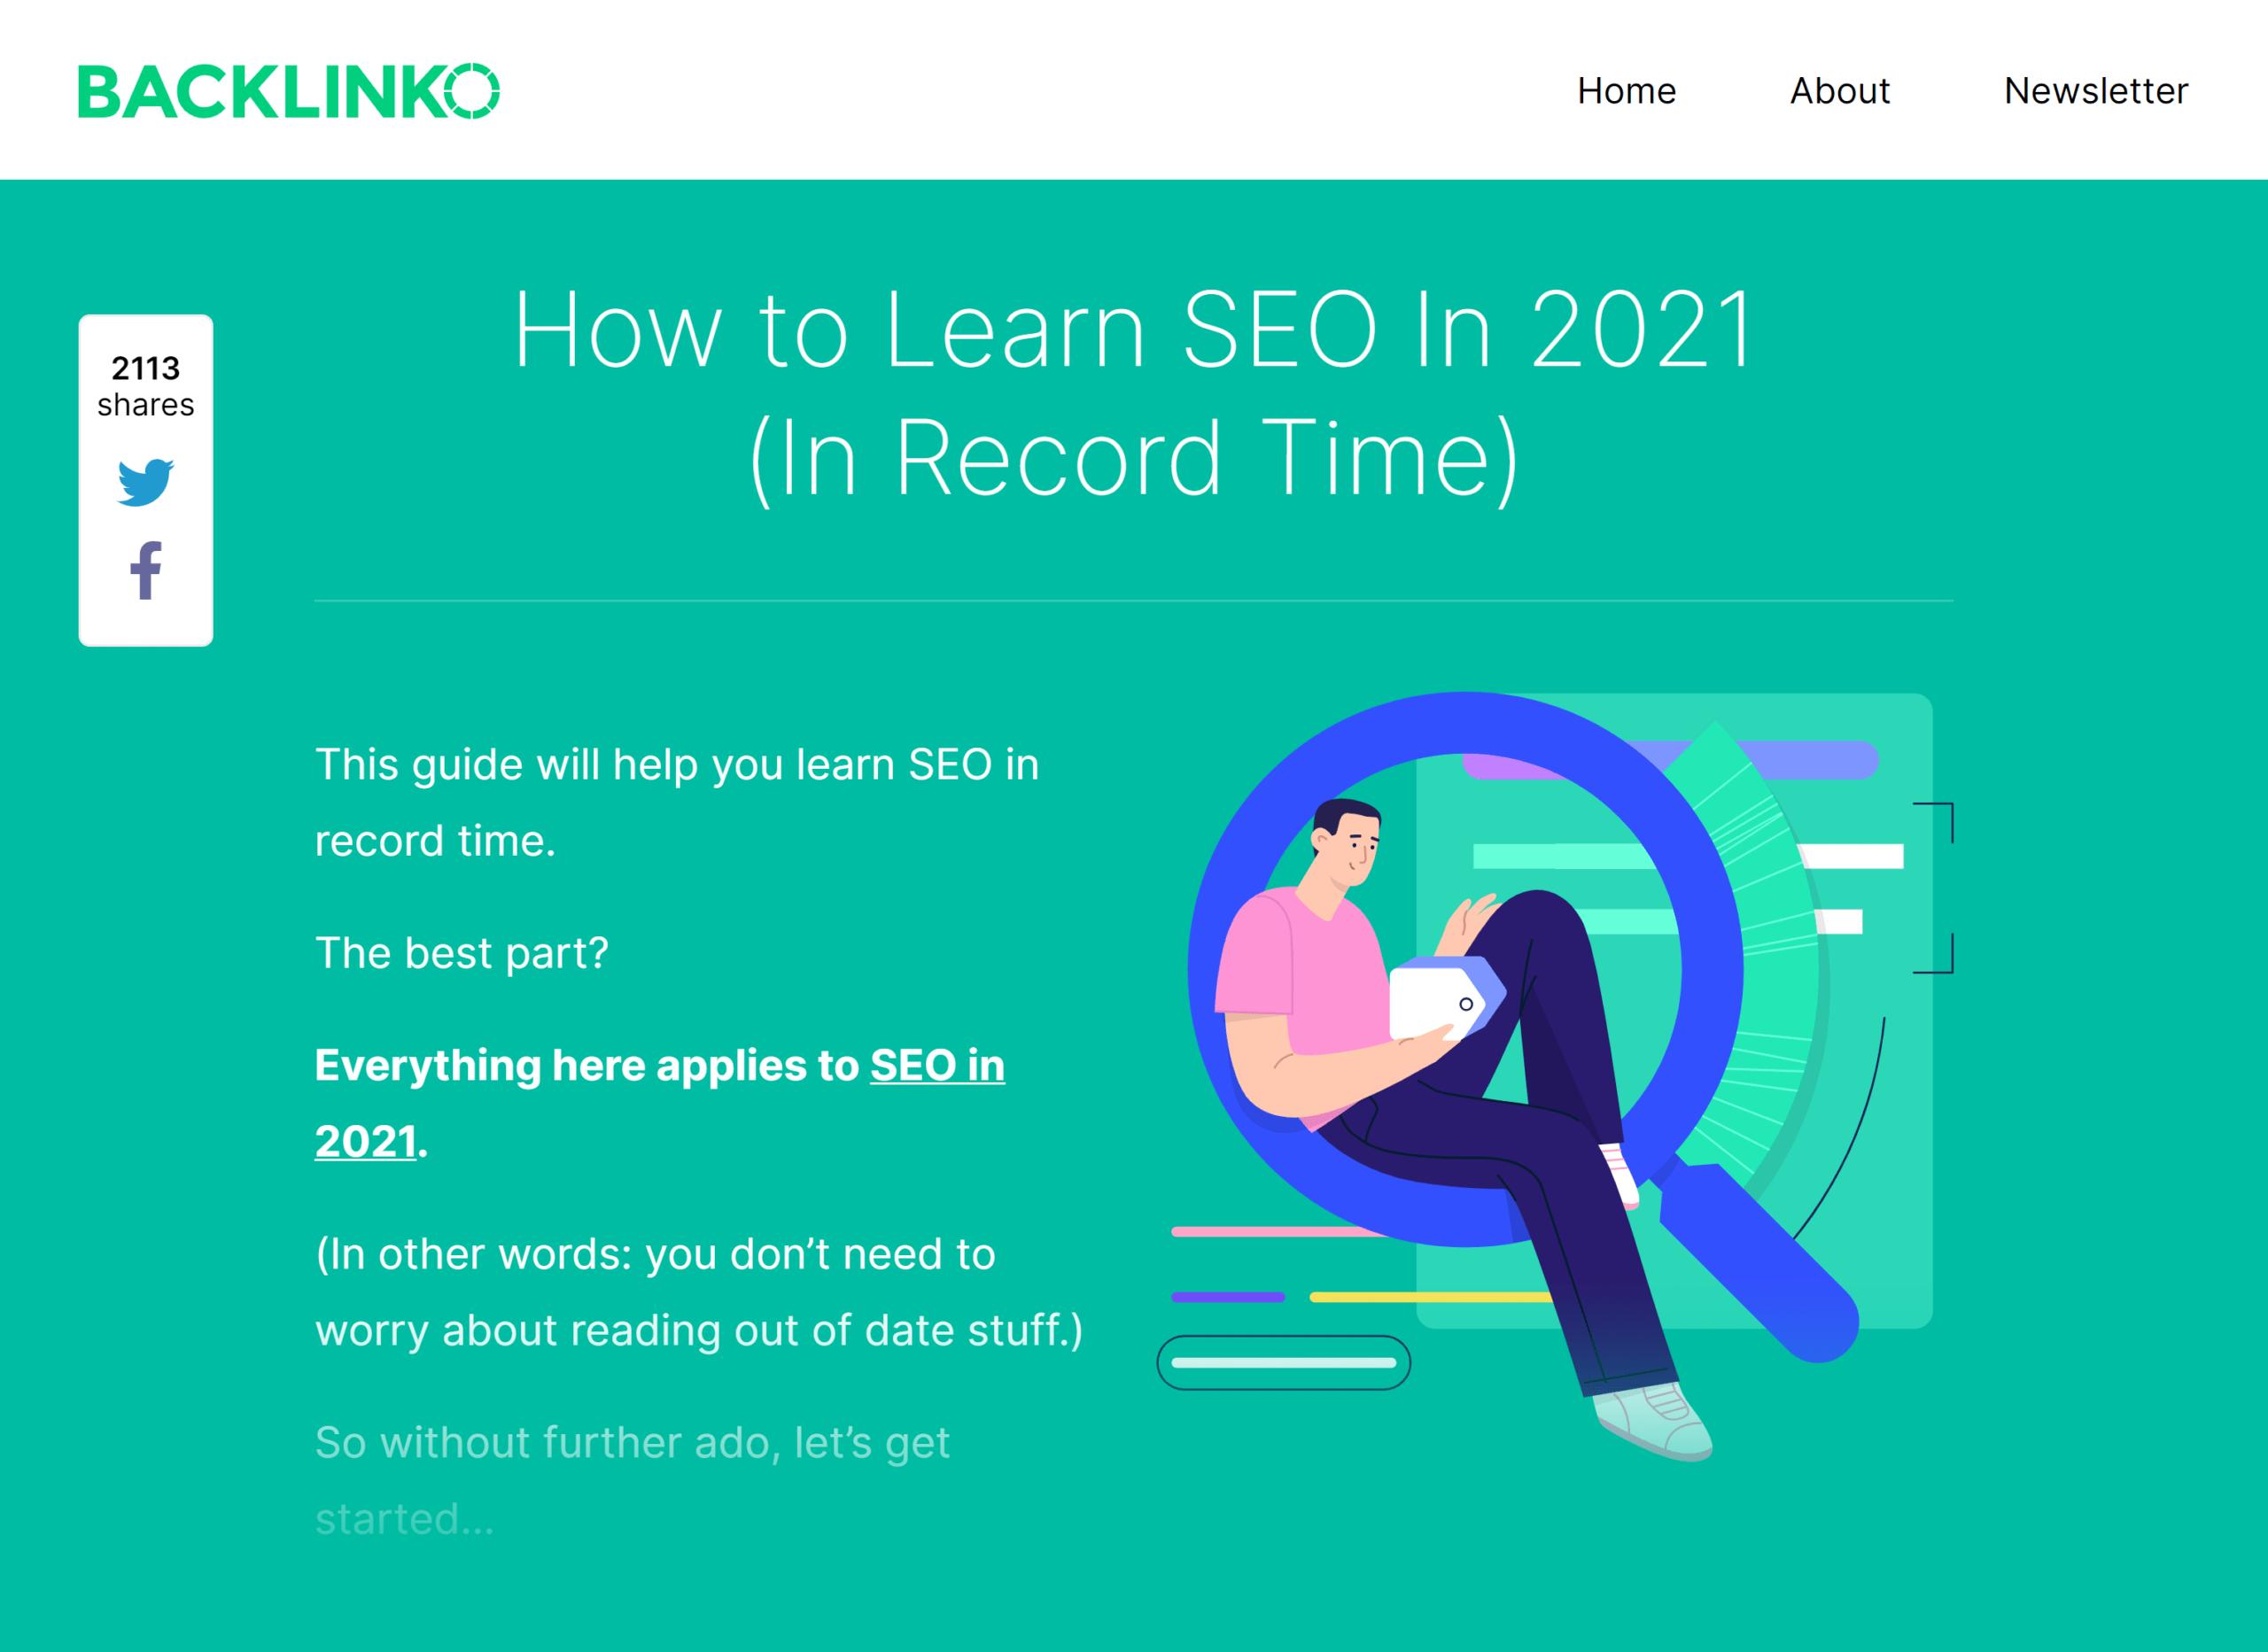 Backlinko – Learn SEO fast